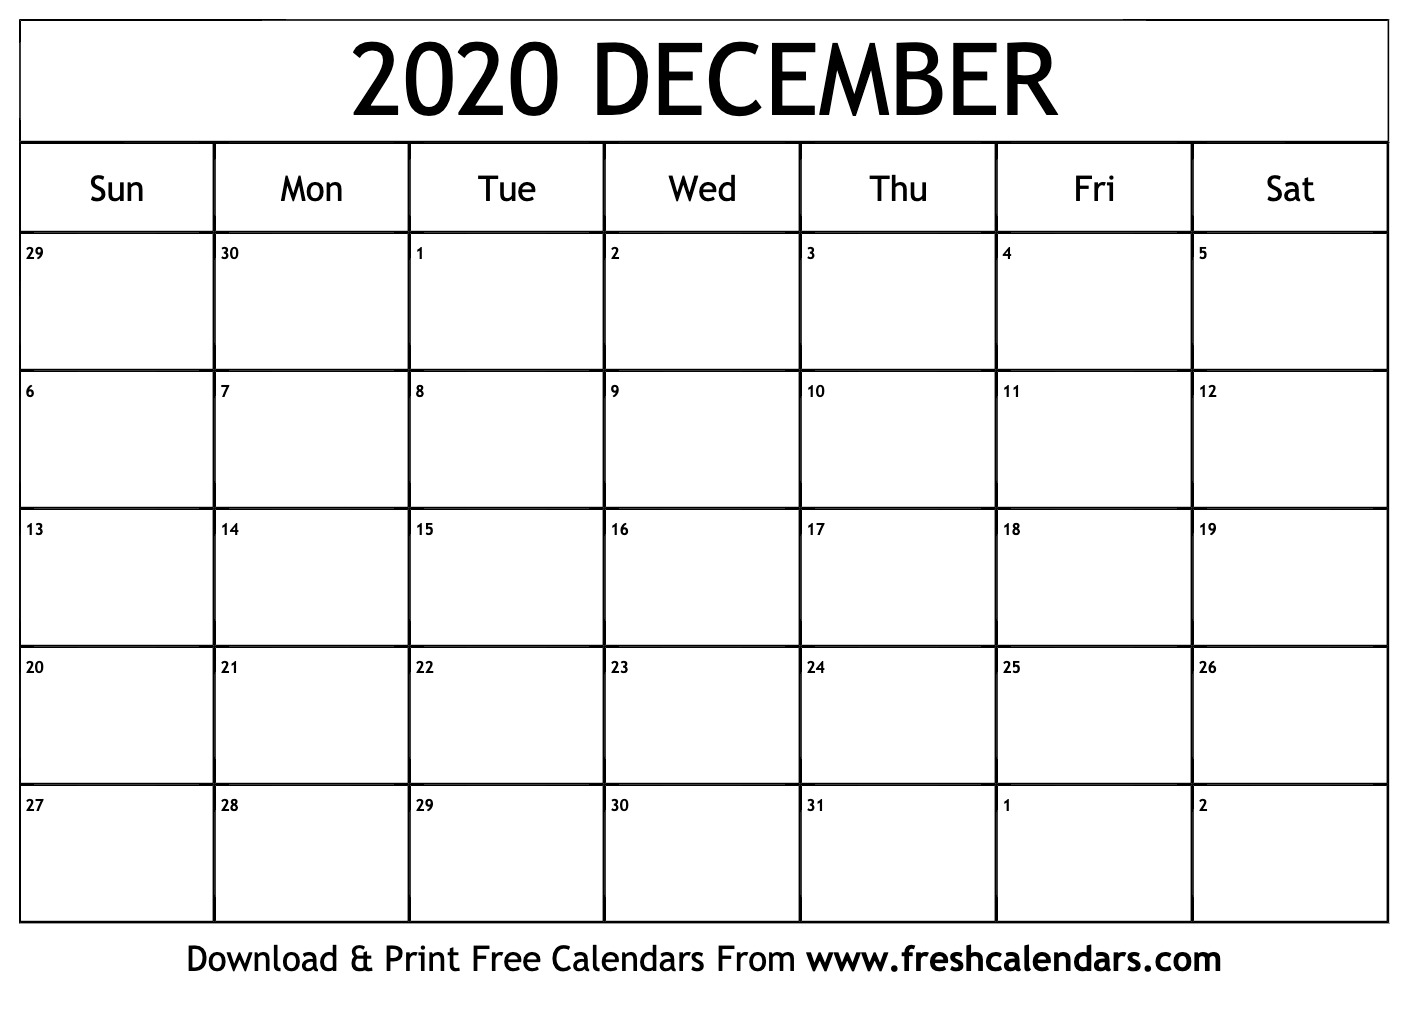 December Calendar 2020.December 2020 Calendar Printable Fresh Calendars